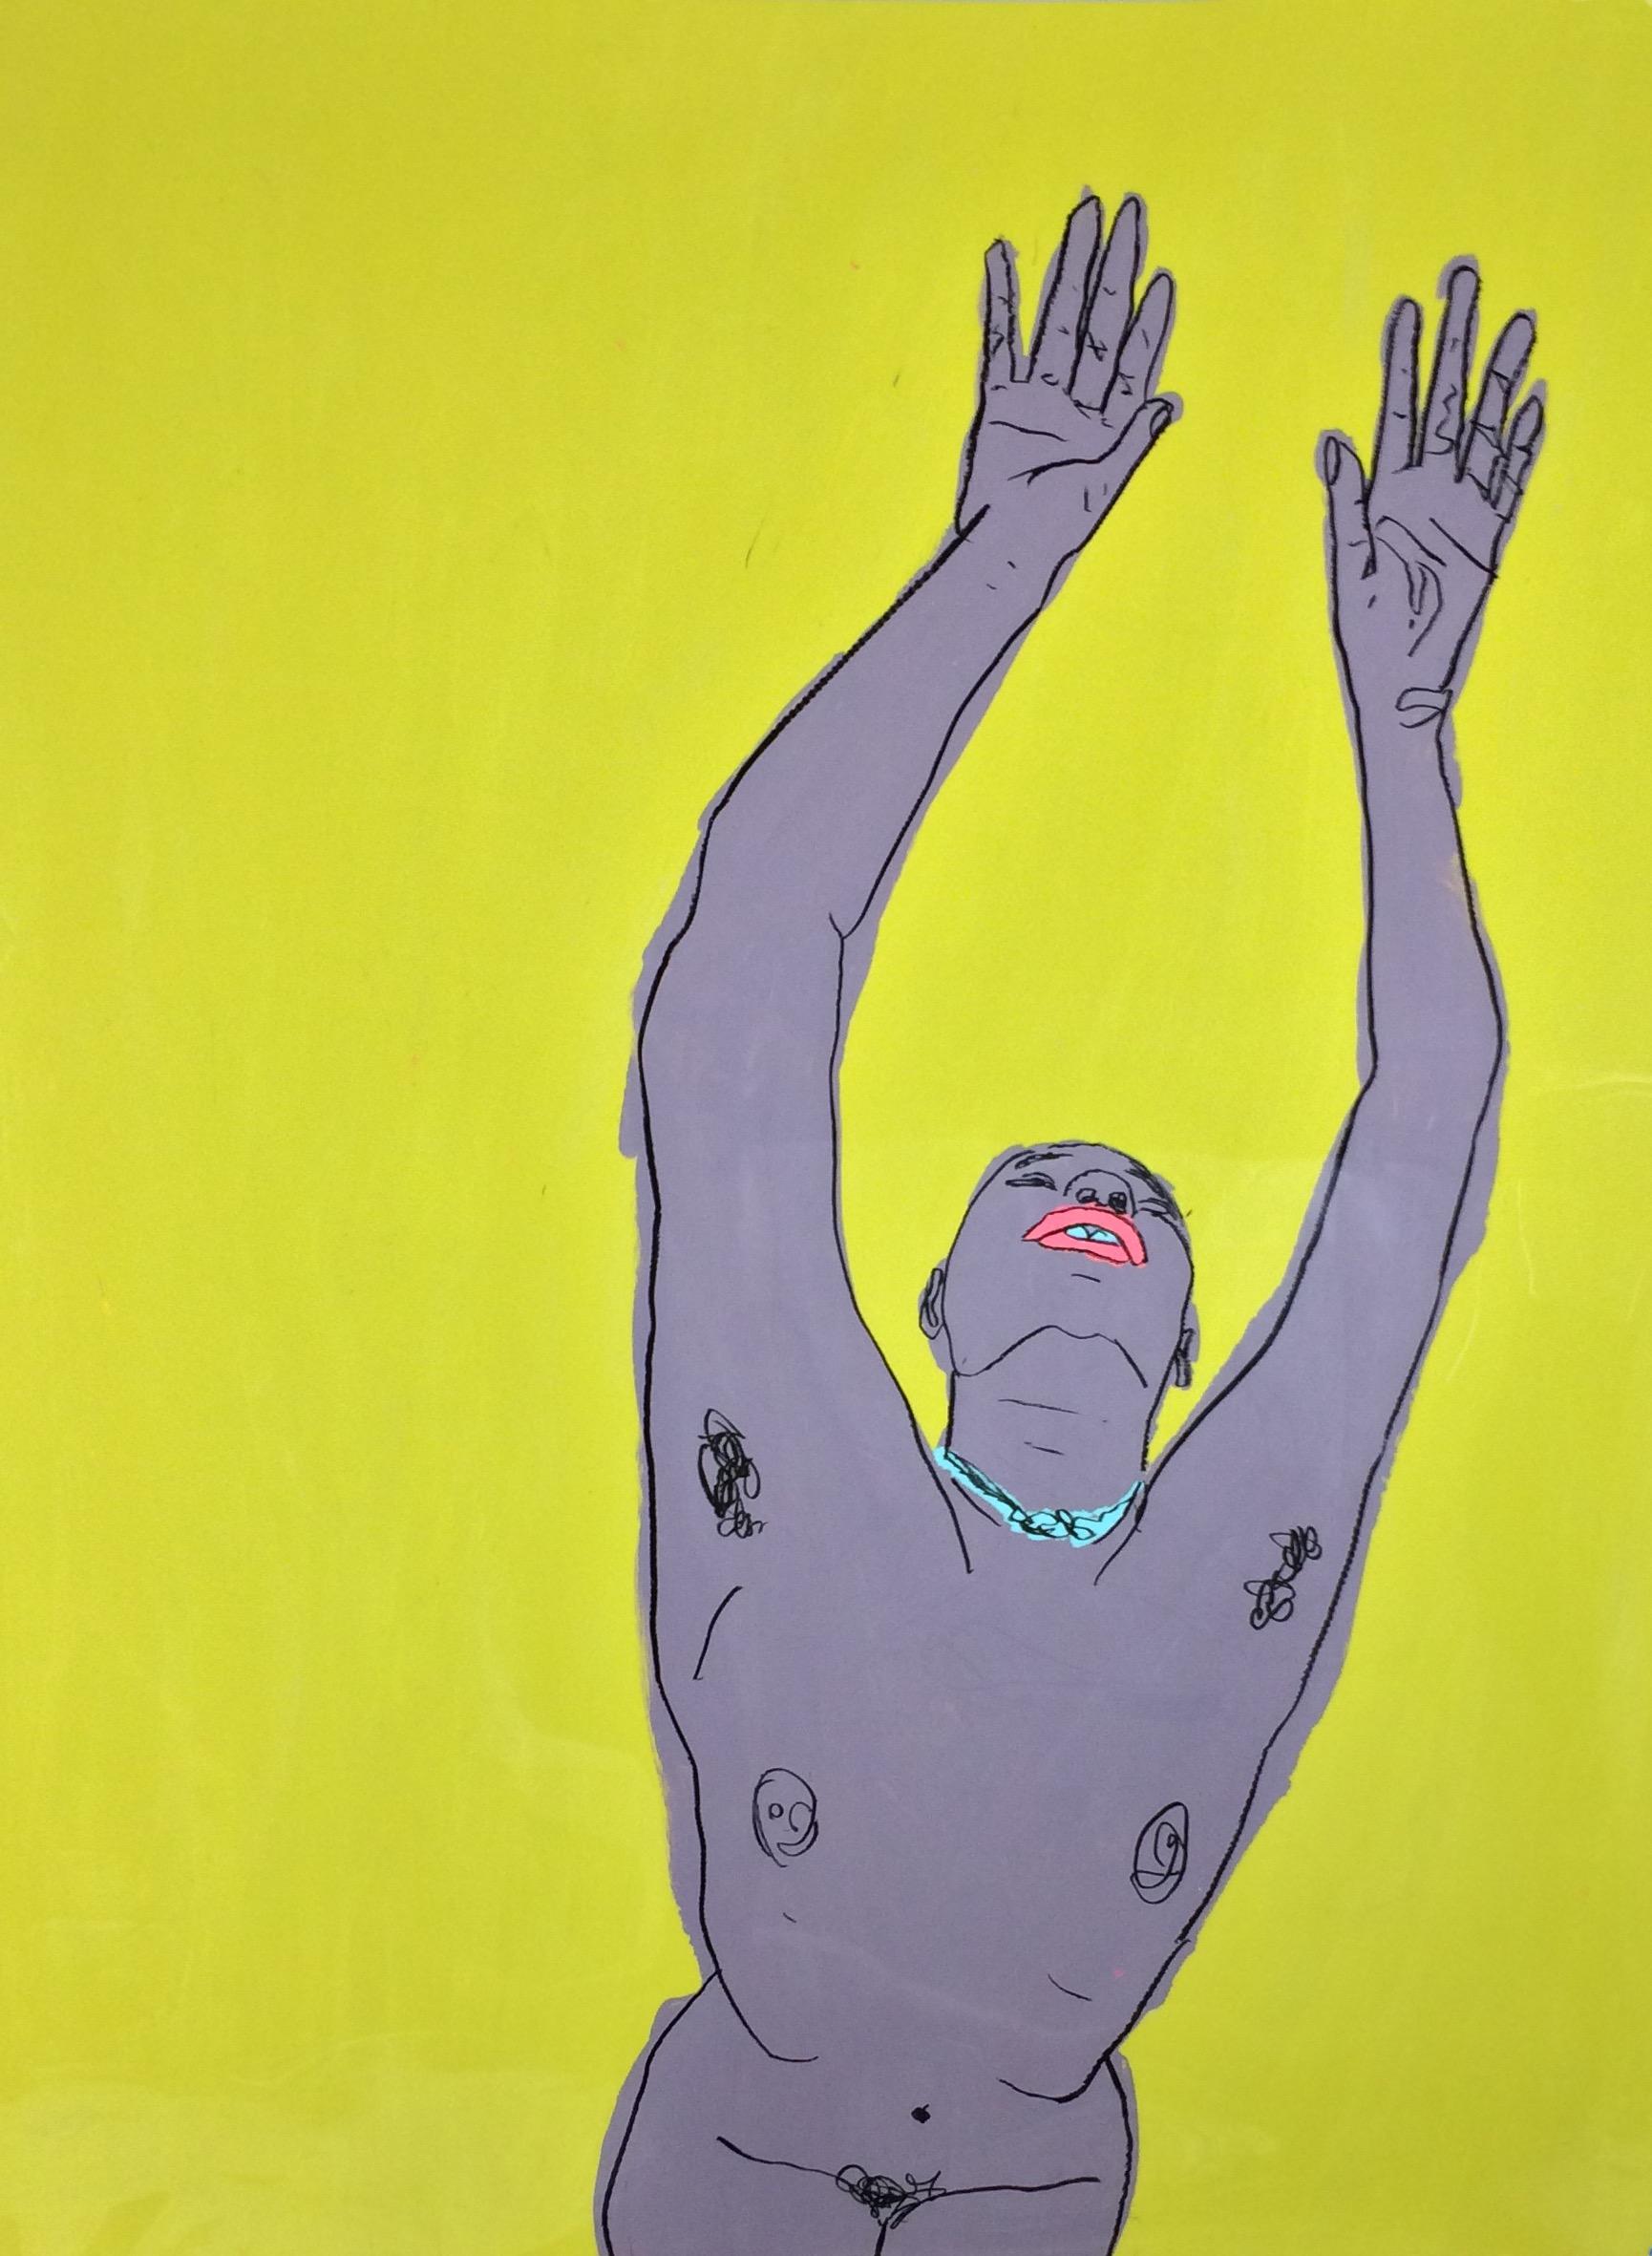 """Torri Hands Overhead"" (2017), black wax marker and acrylic paint on dura-lar."